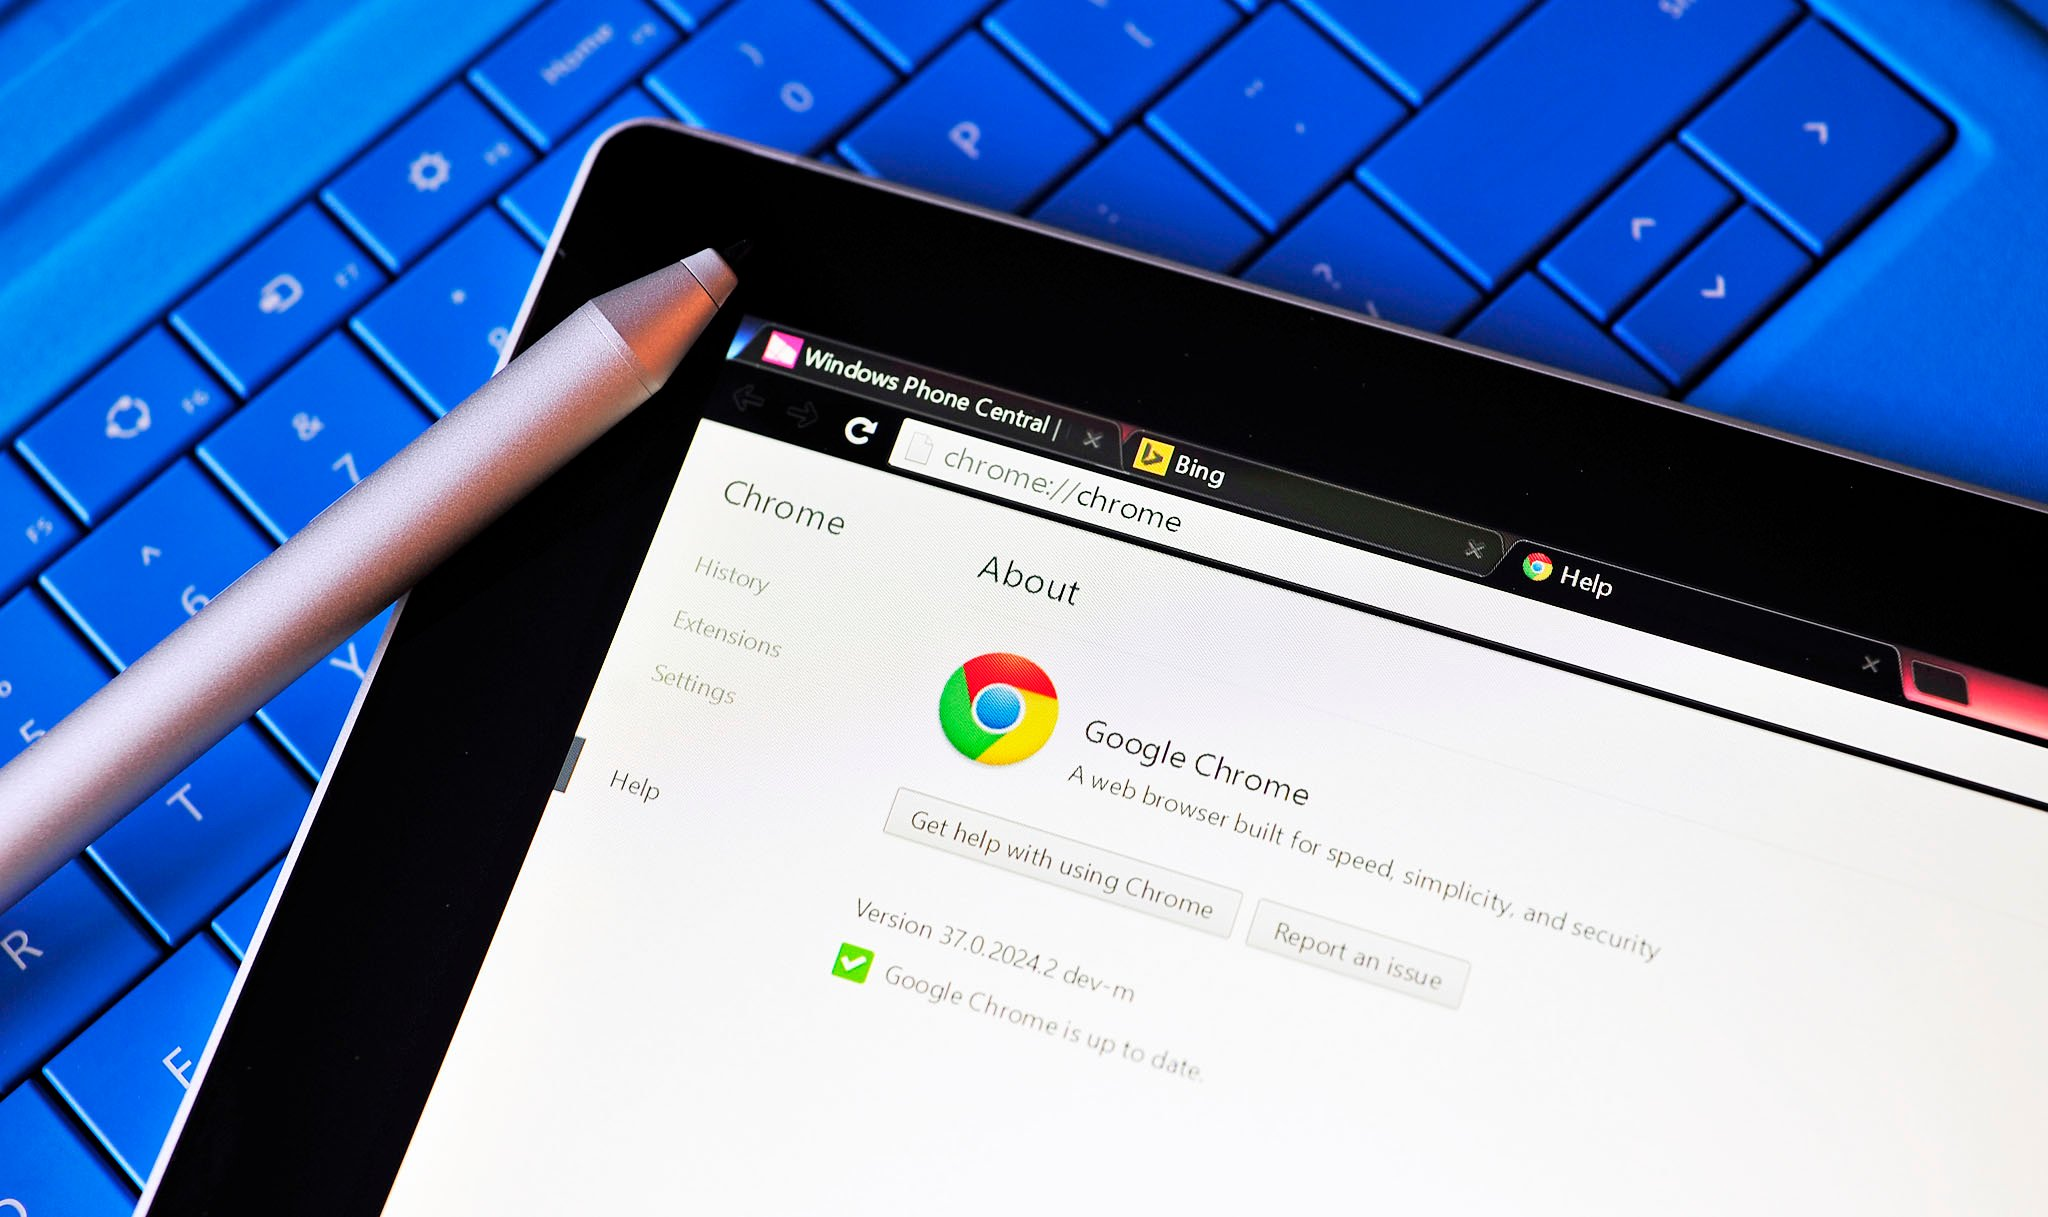 Google Chrome 64-bit dev hits Windows 7 and 8 | Windows Central